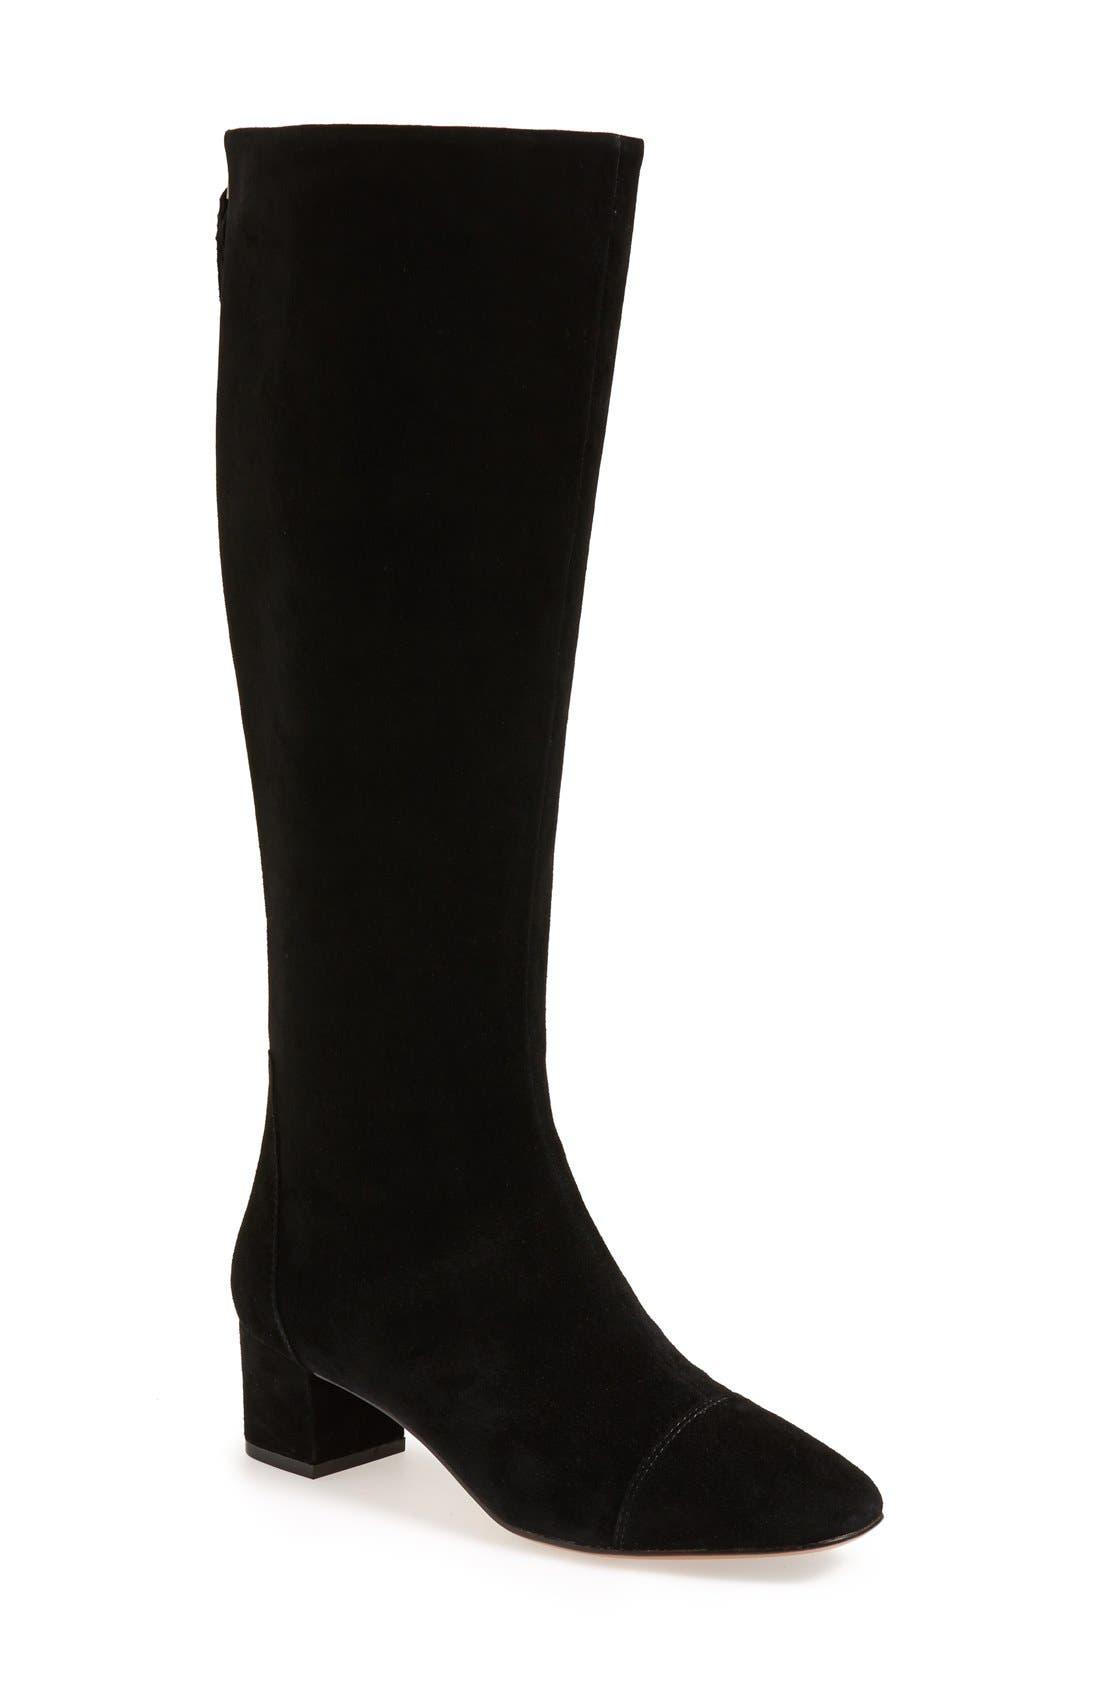 Alternate Image 1 Selected - Nine West 'Anatola' Tall Boot (Women)